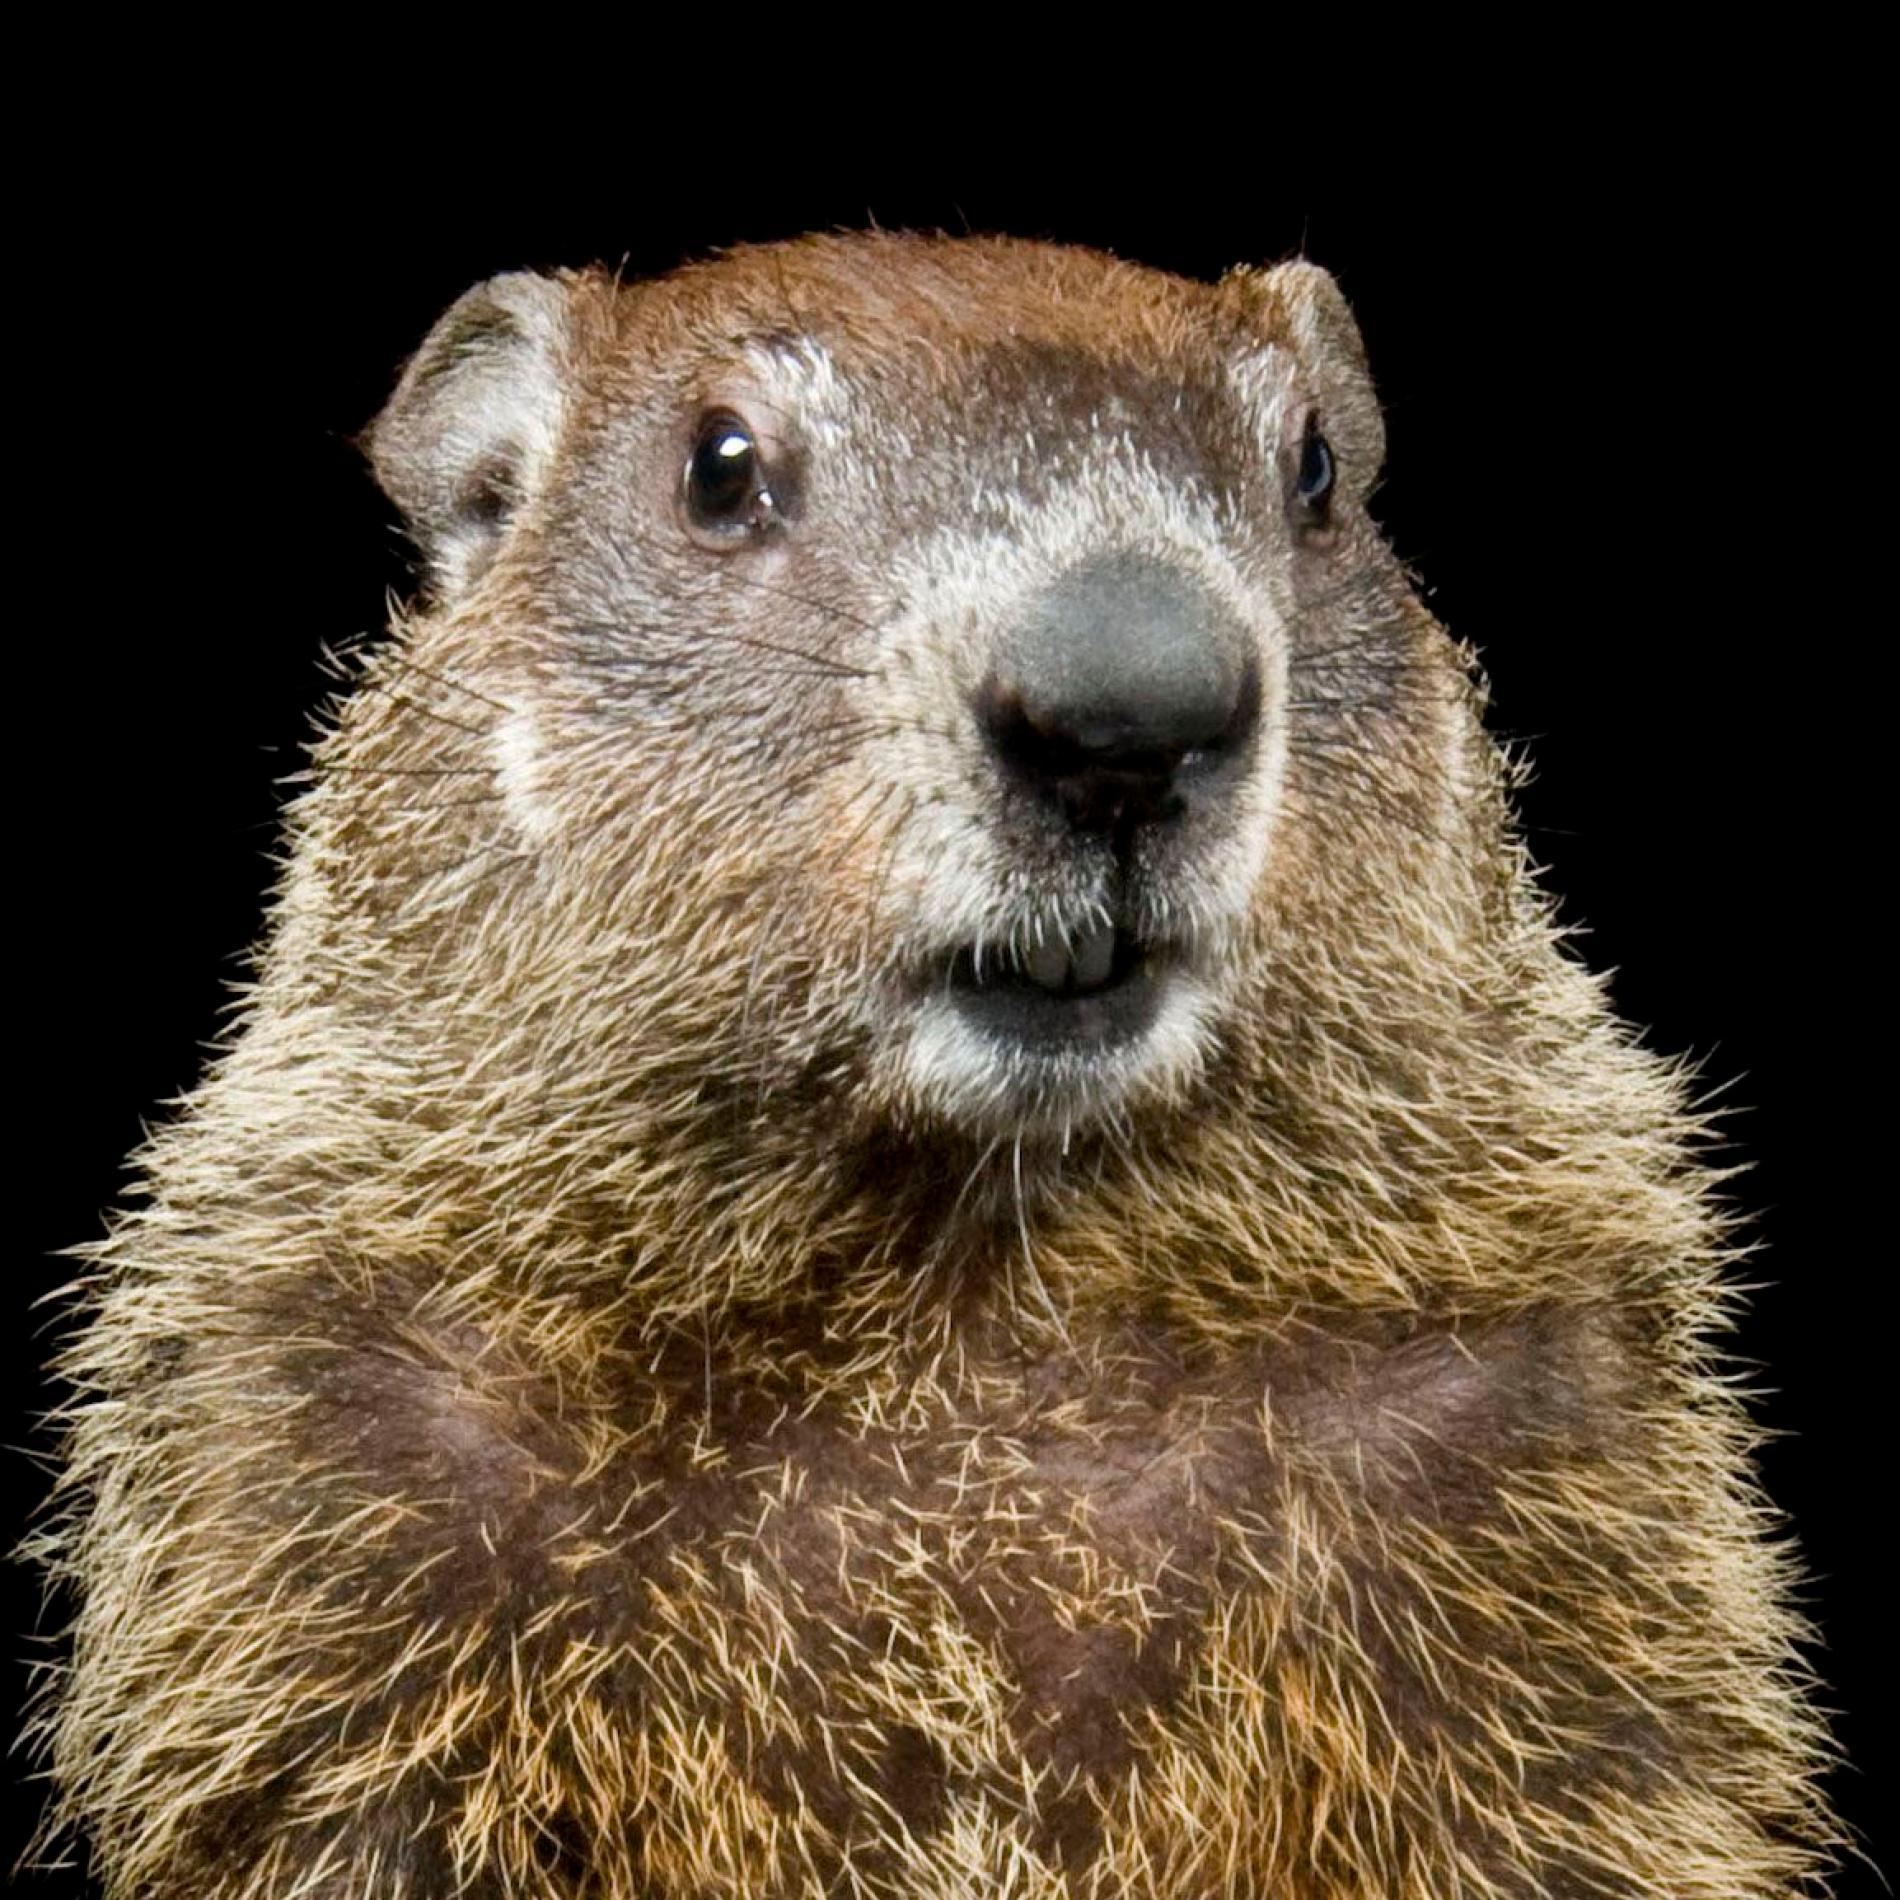 HD Quality Wallpaper | Collection: Animal, 1900x1900 Groundhog